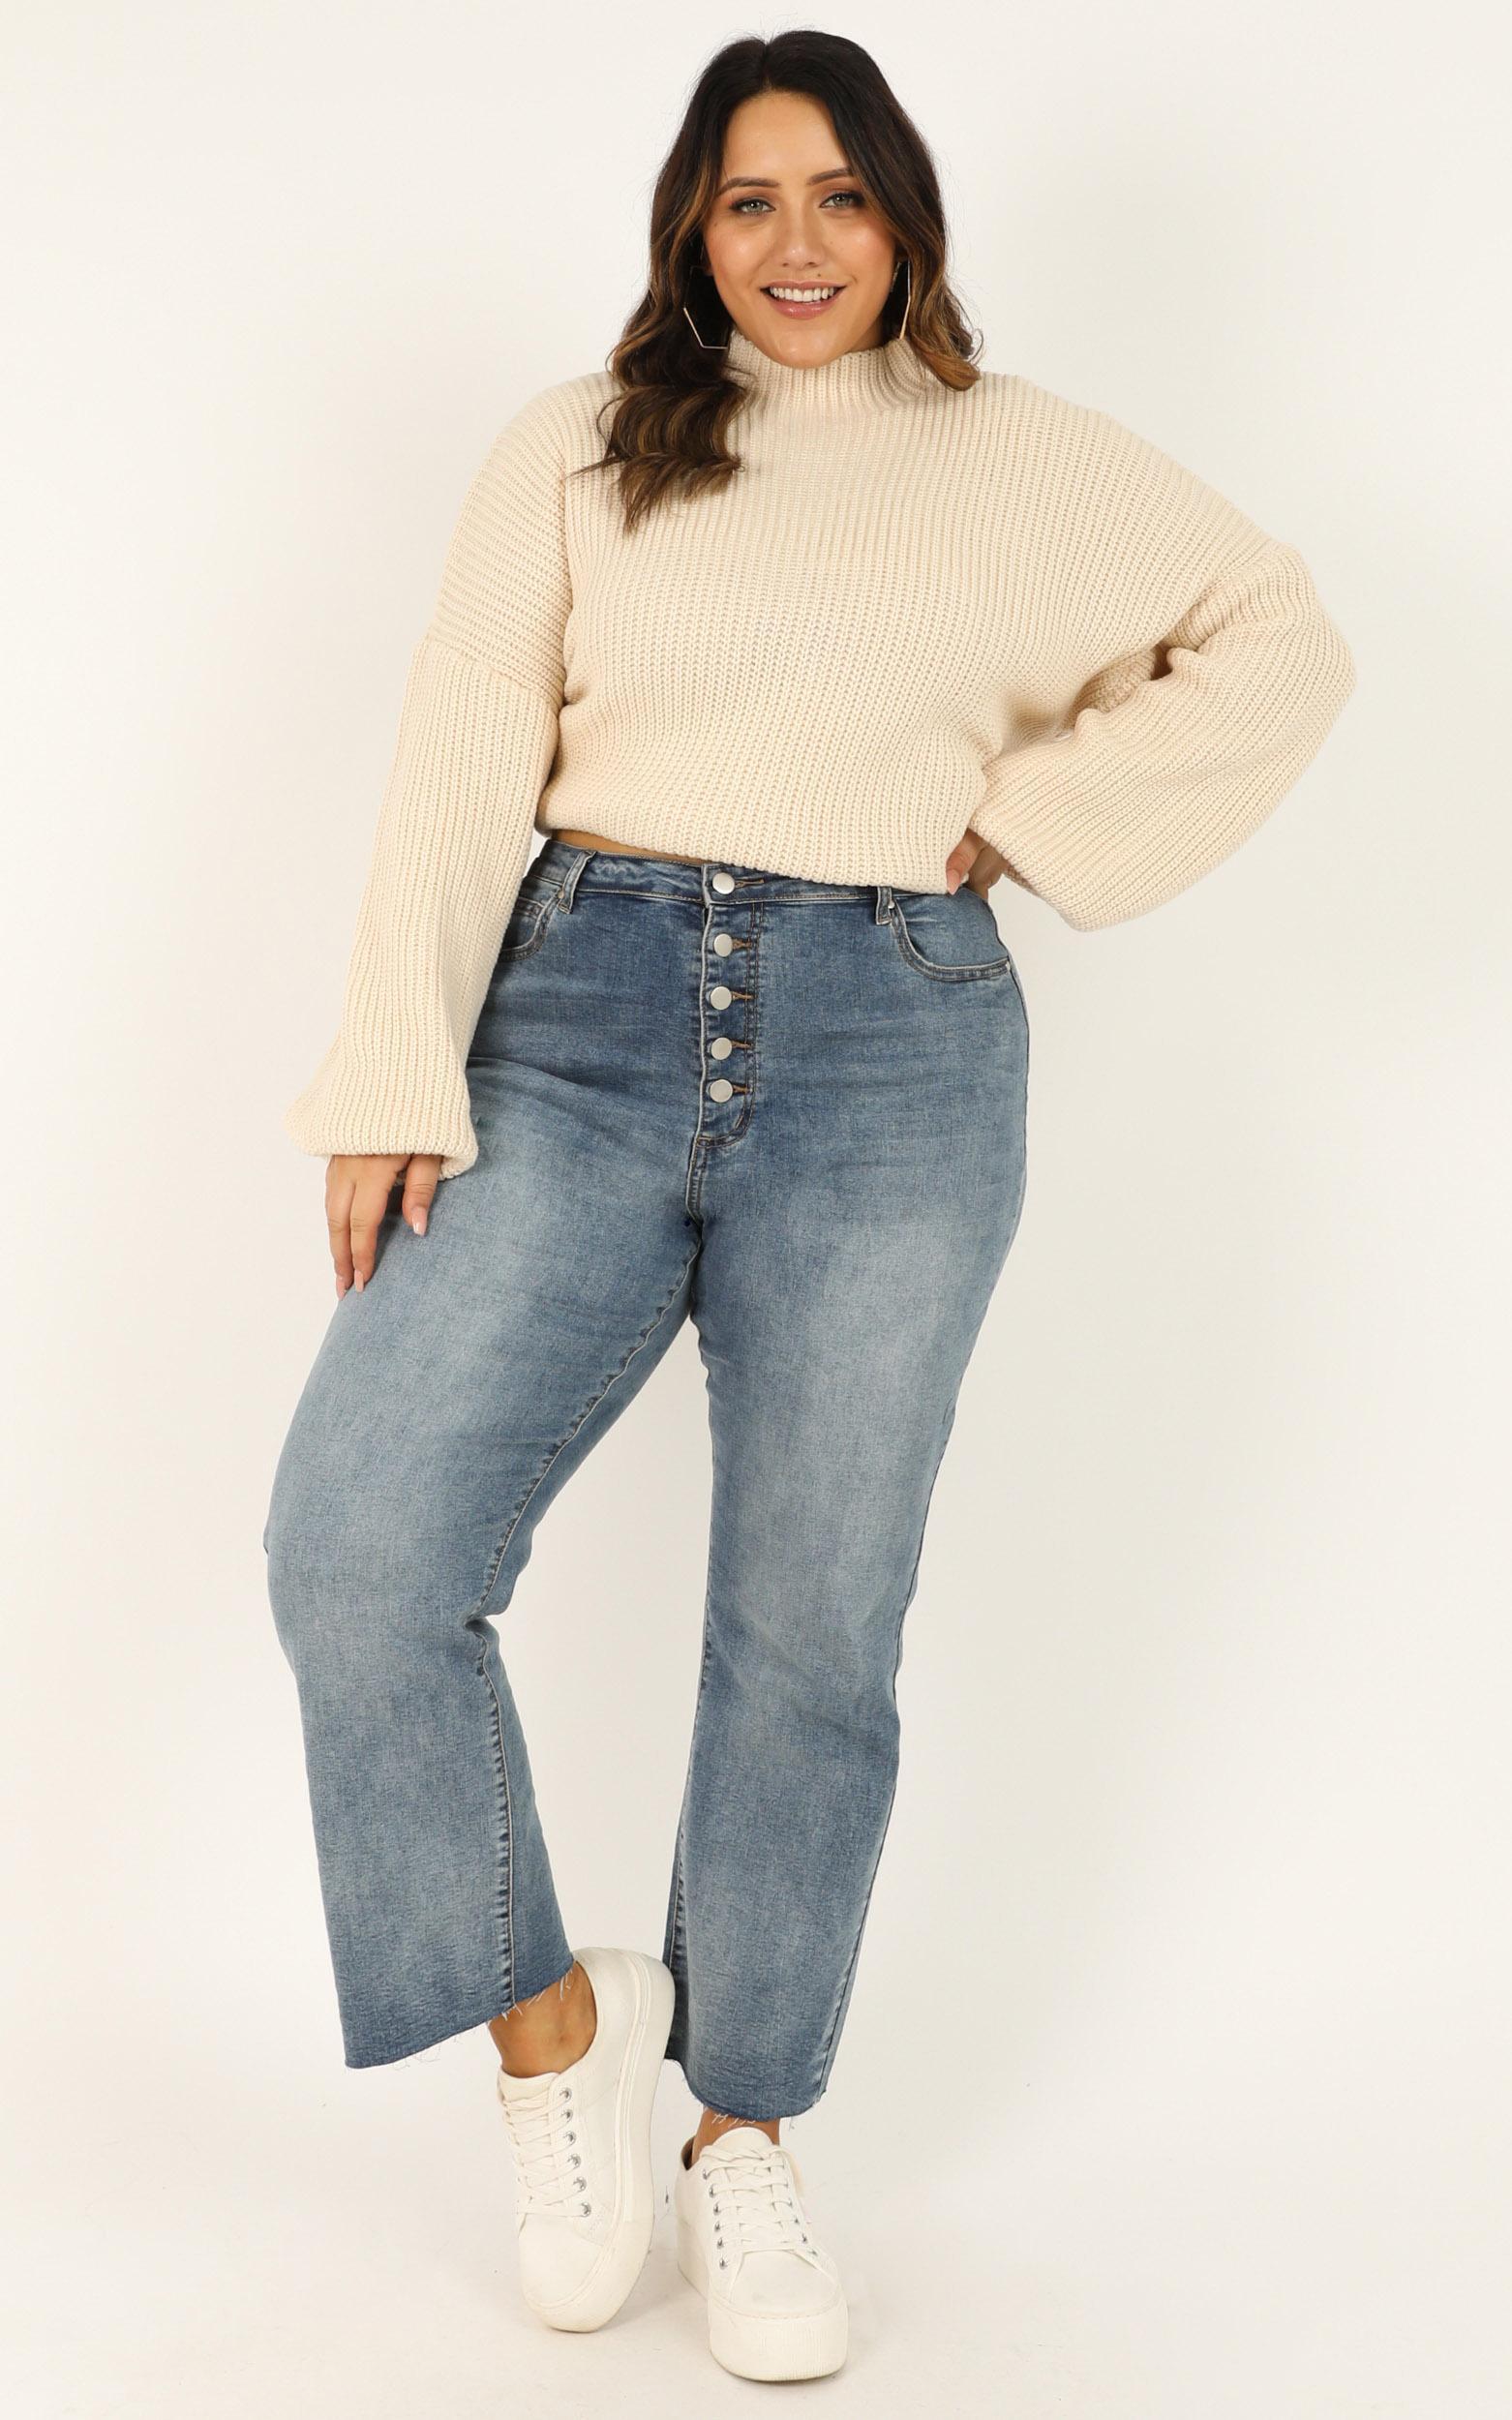 I Feel Love Oversized Knit Jumper In Cream, Cream, hi-res image number null